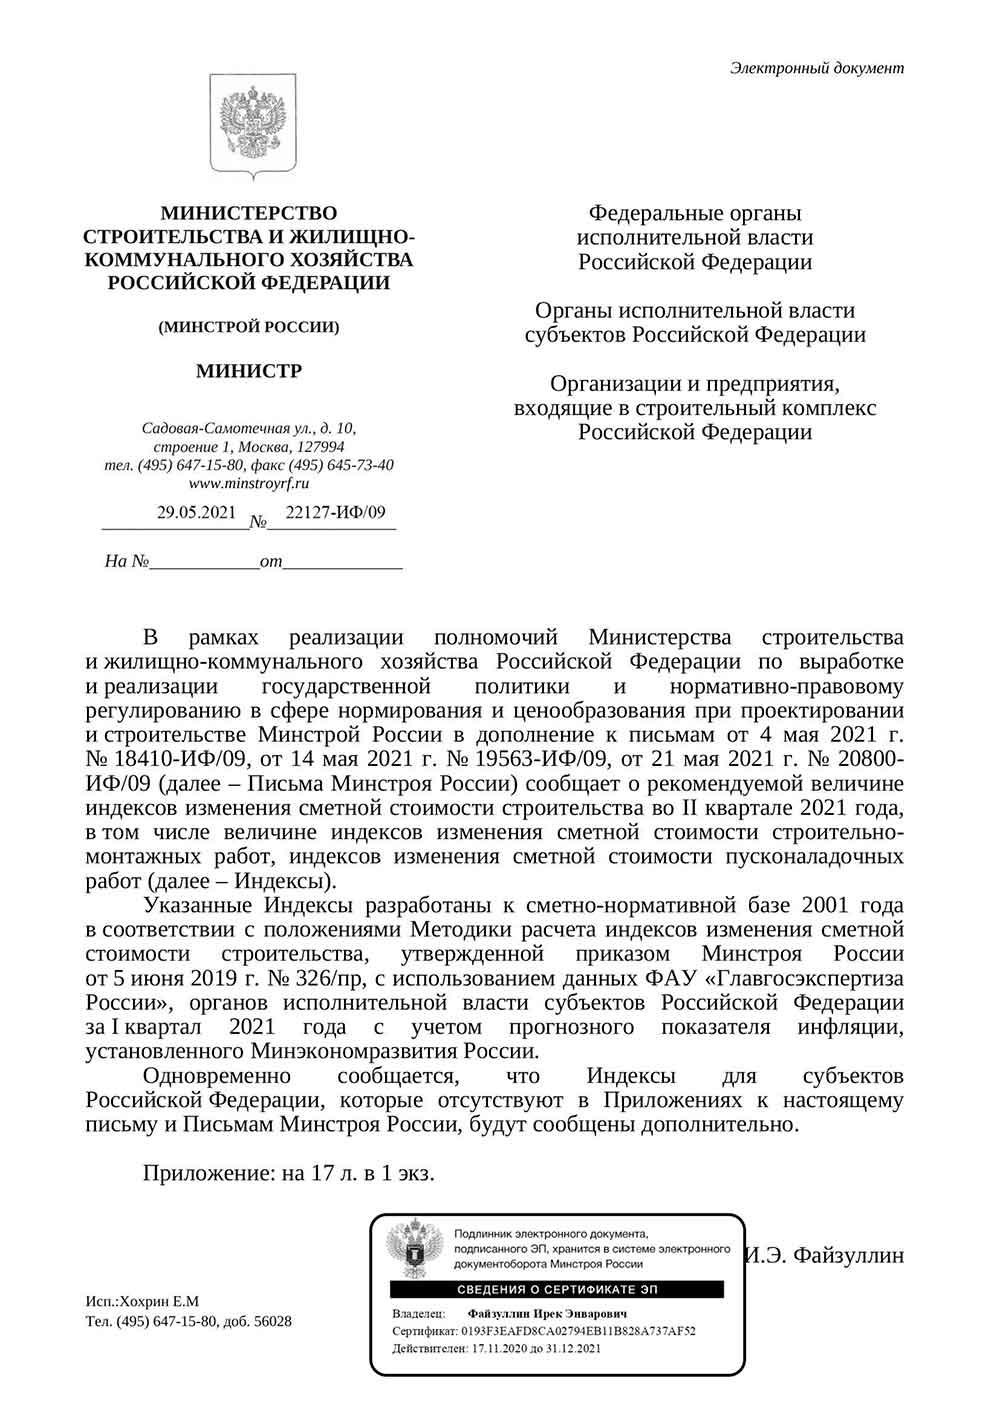 Письмо Минстроя РФ №22127-ИФ/09 от 29.05.2021 г.